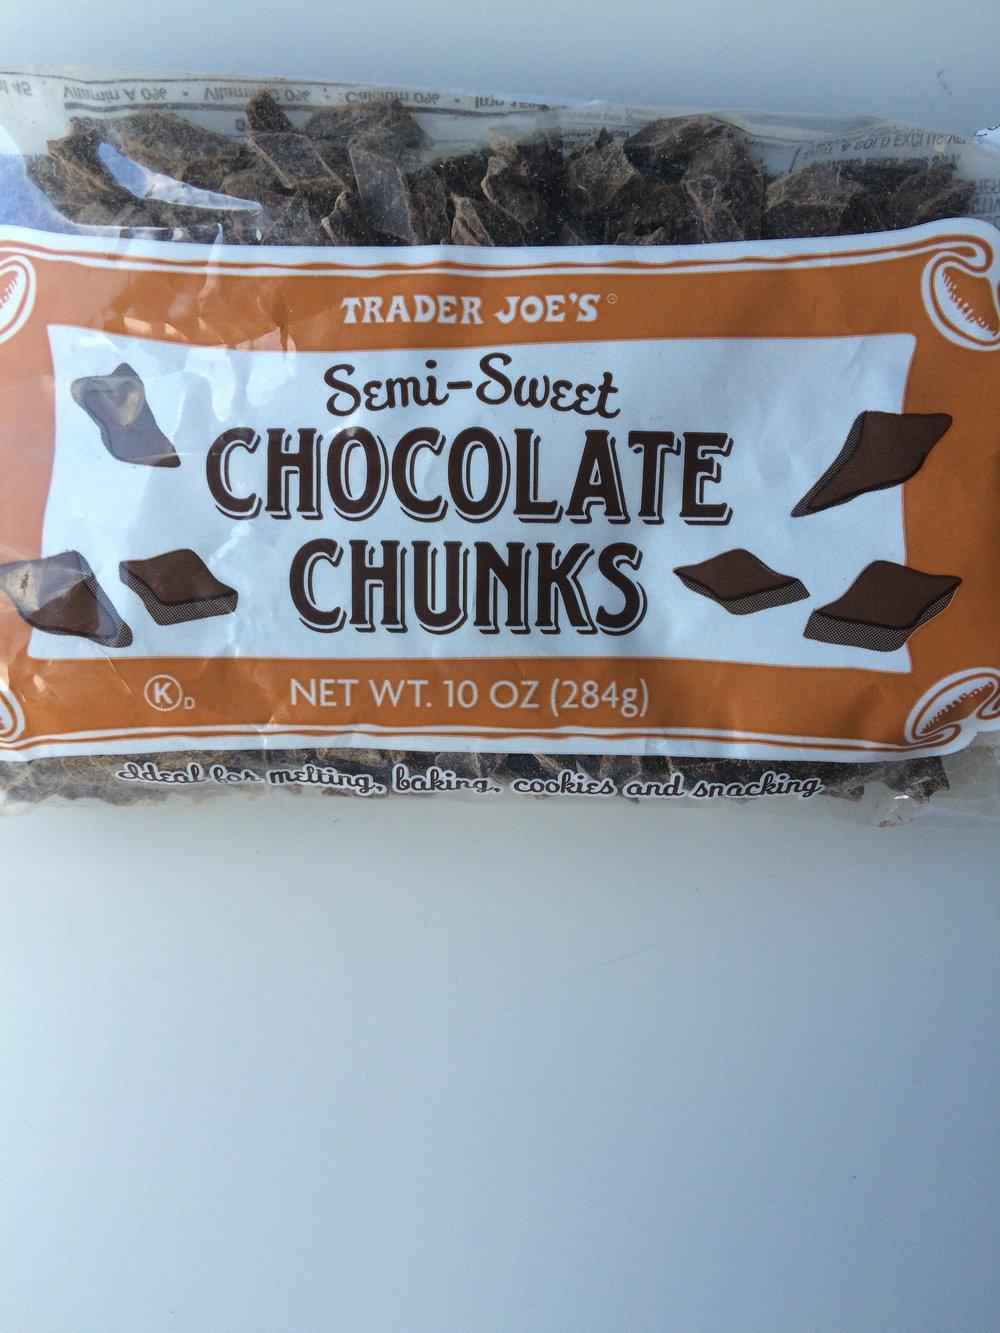 Choco Chocolate Chunks.JPG